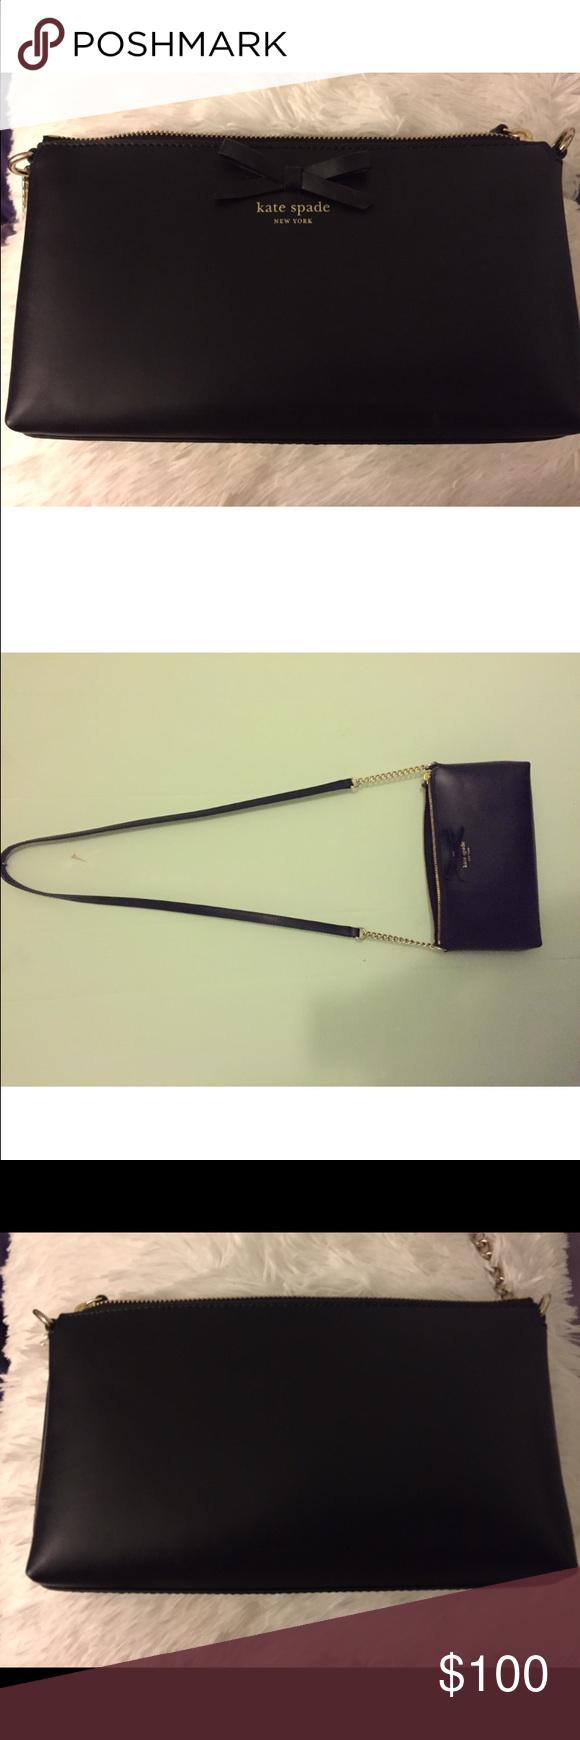 Kate Spade crossbody purse Black Kate Spade crossbody bag. Never used kate spade Bags Crossbody Bags